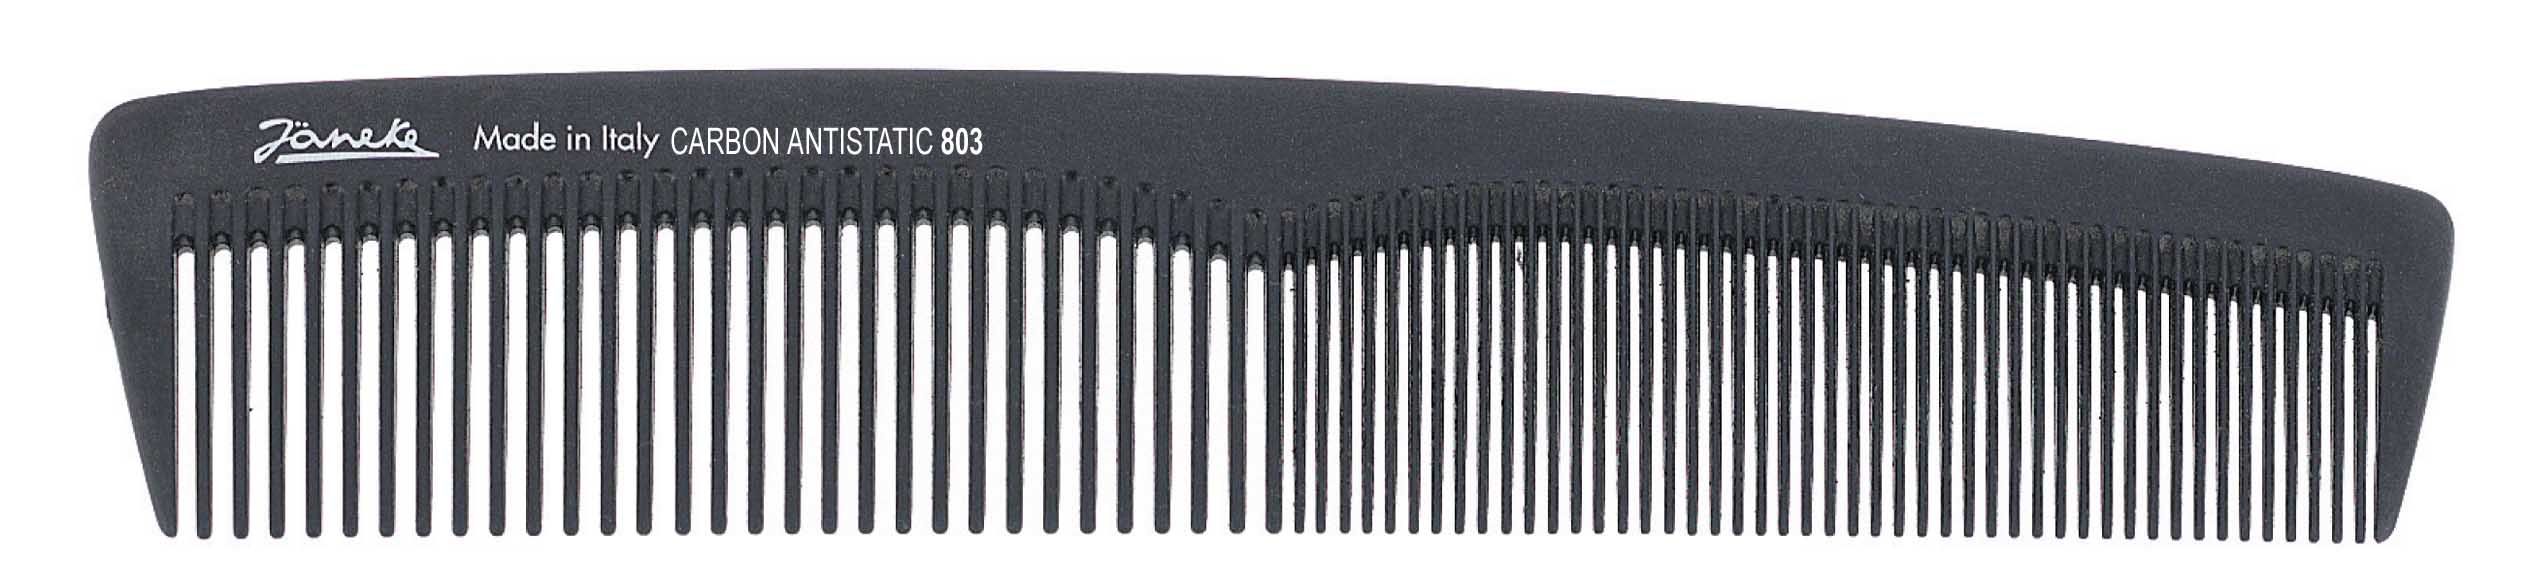 Toilet comb 20,5 cm Cod. 55803